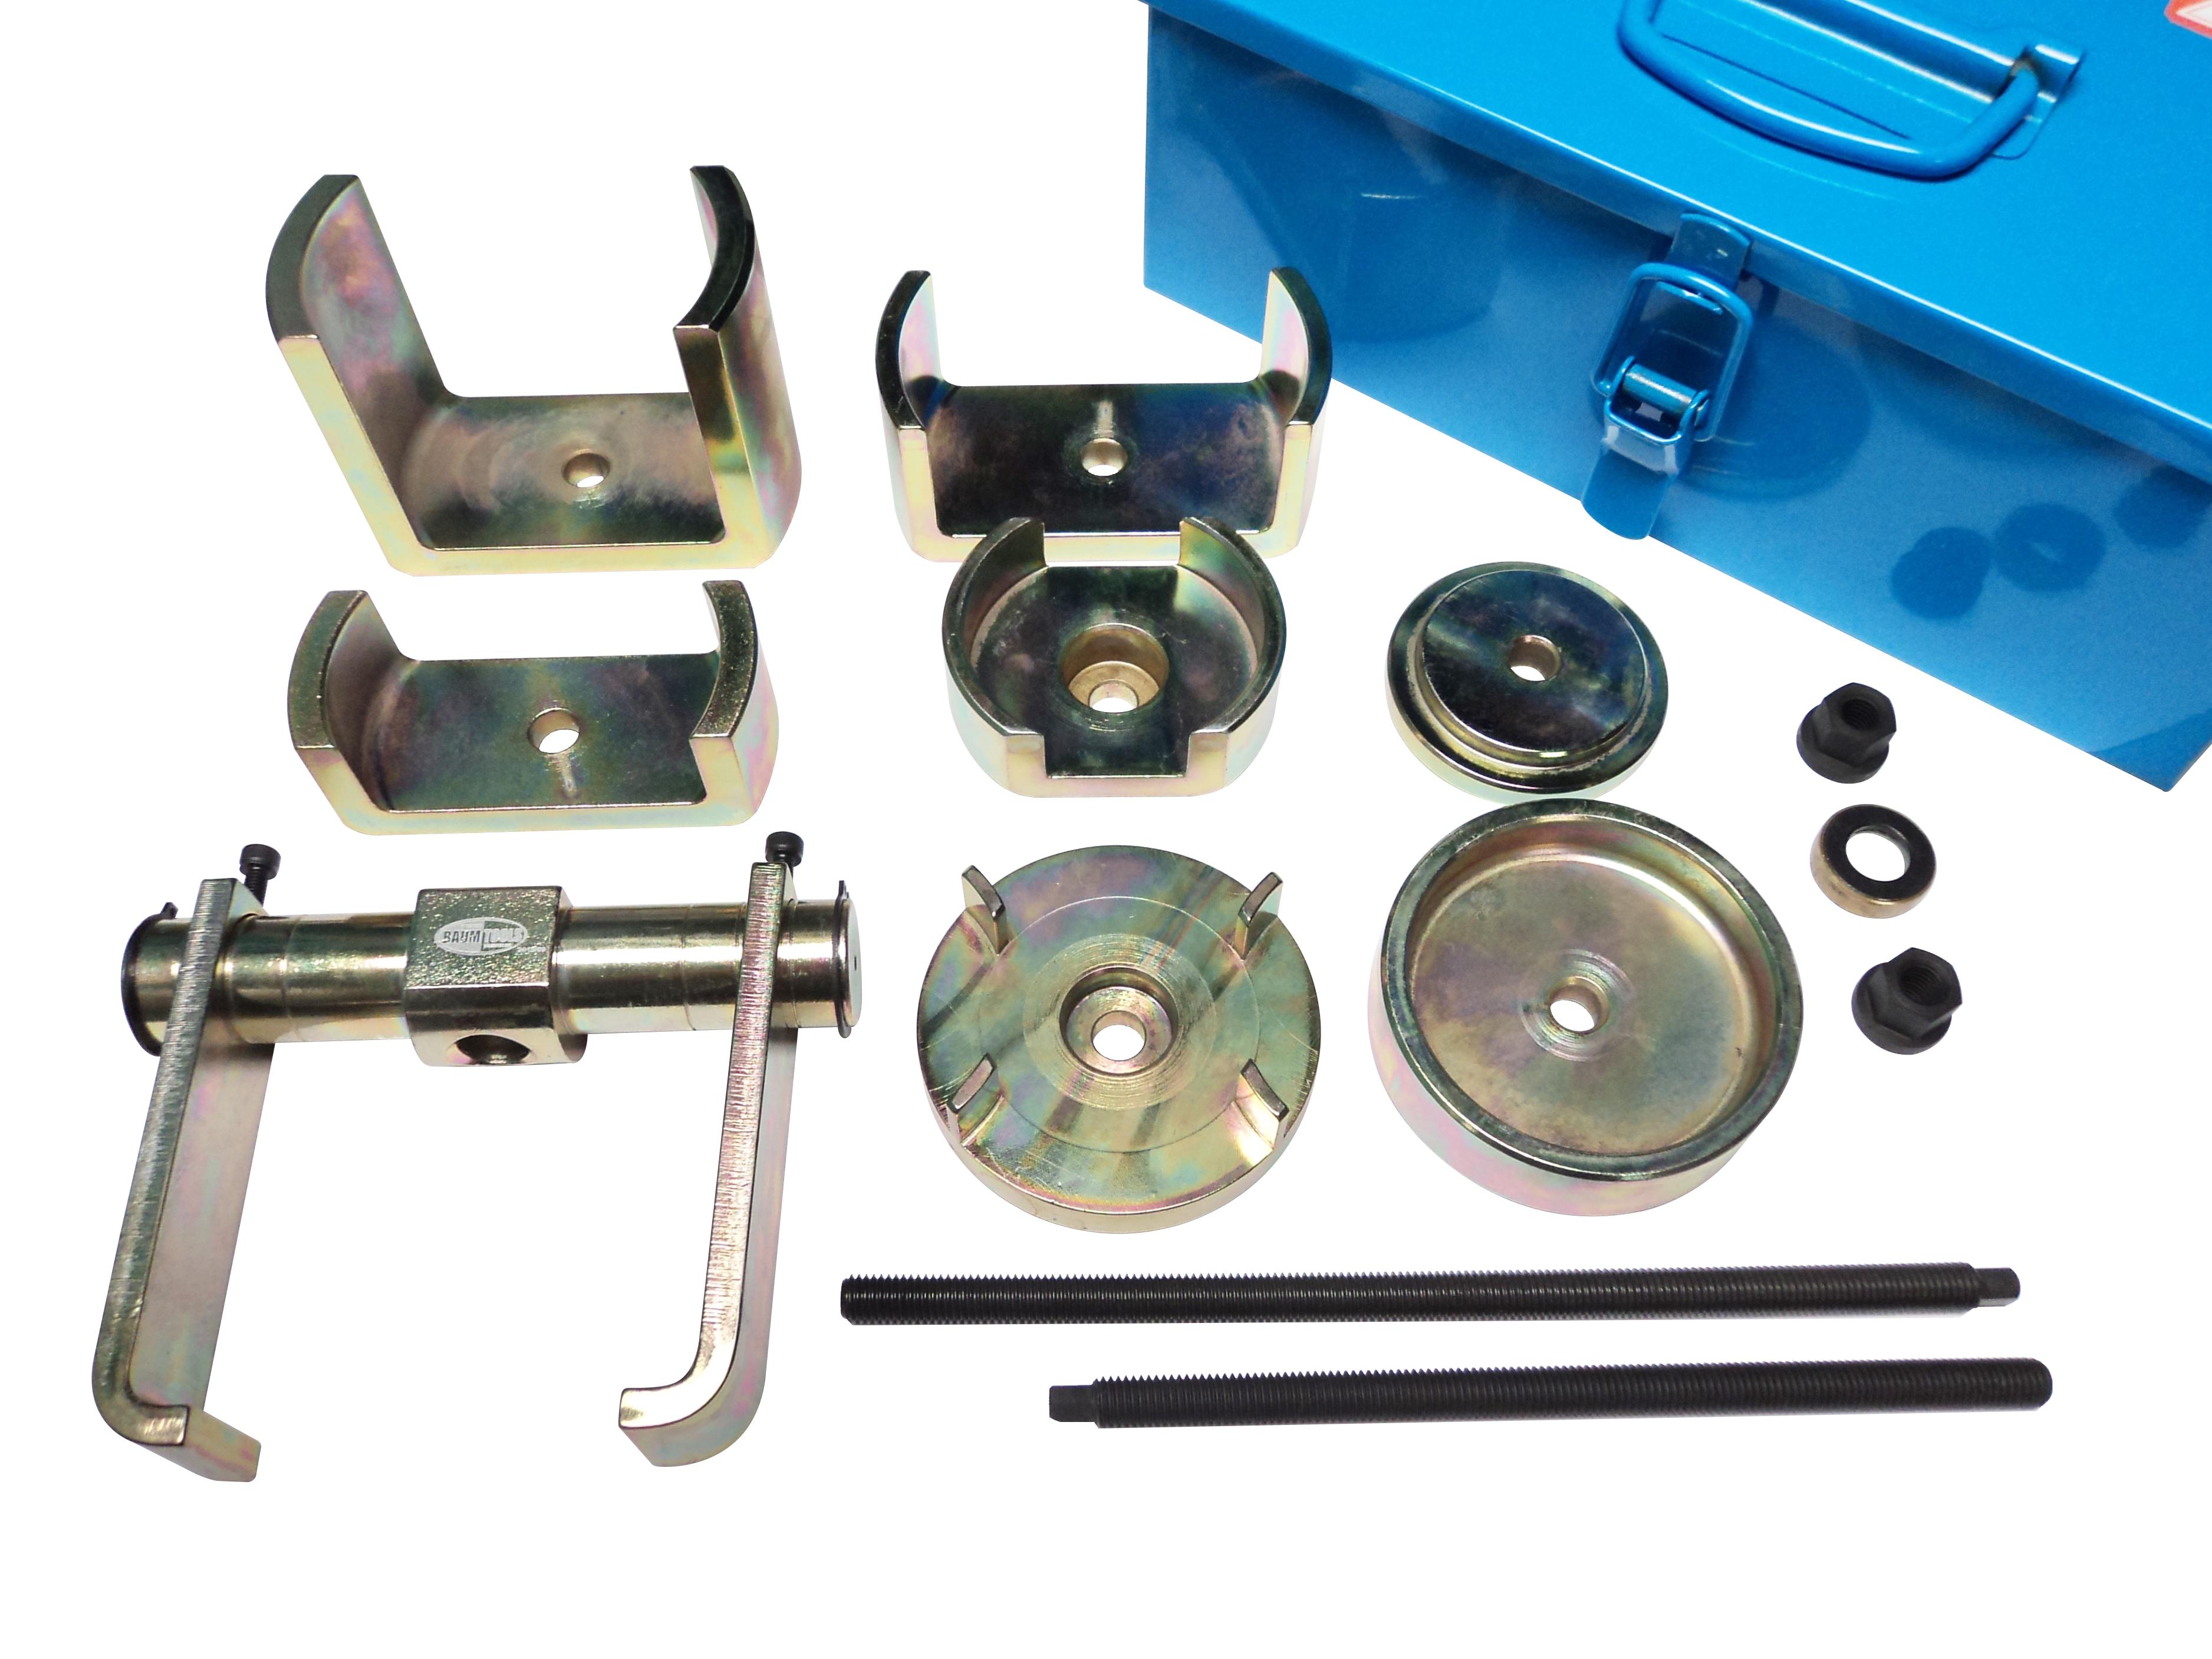 B221-0043 221 Subframe Busing Remover and Installer Kit